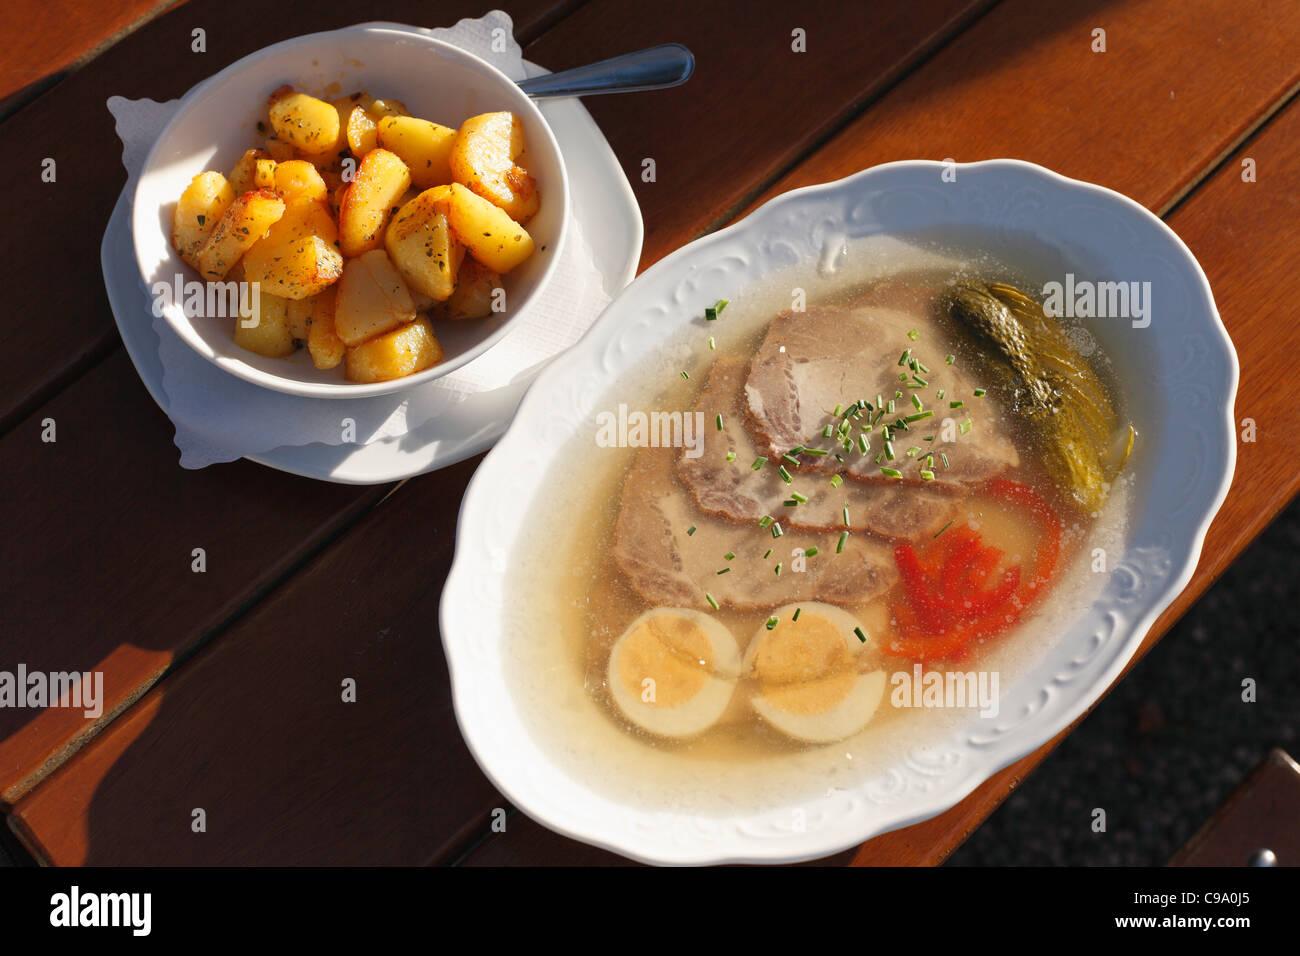 Germany, Bavaria, Murnau, Close up of roast aspic and fried potatoes on wood table - Stock Image